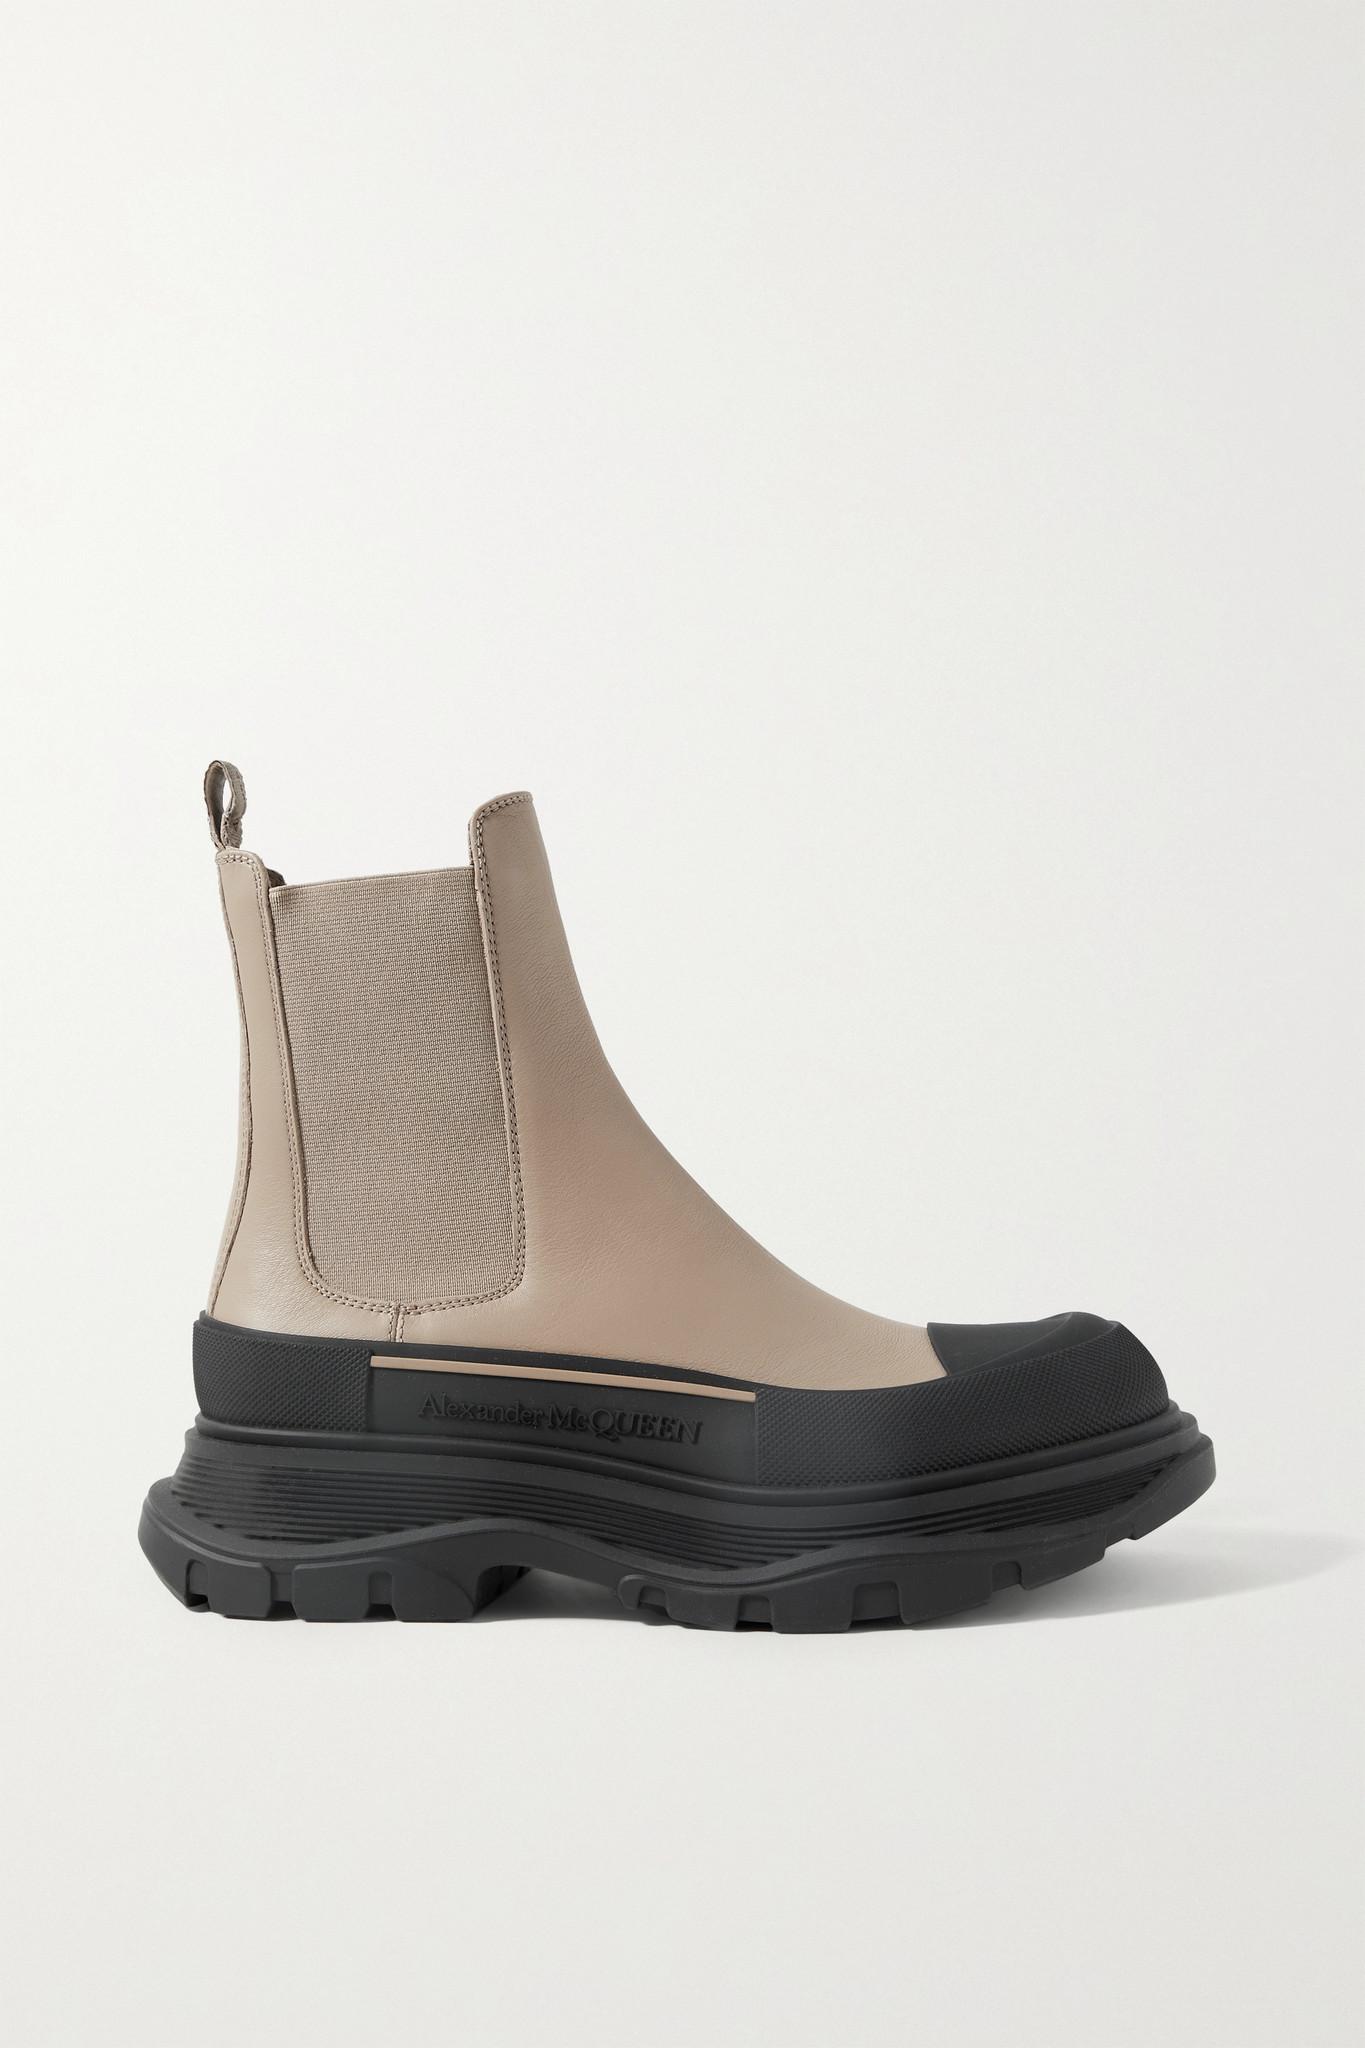 ALEXANDER MCQUEEN - 皮革厚底切尔西靴 - 中性色 - IT40